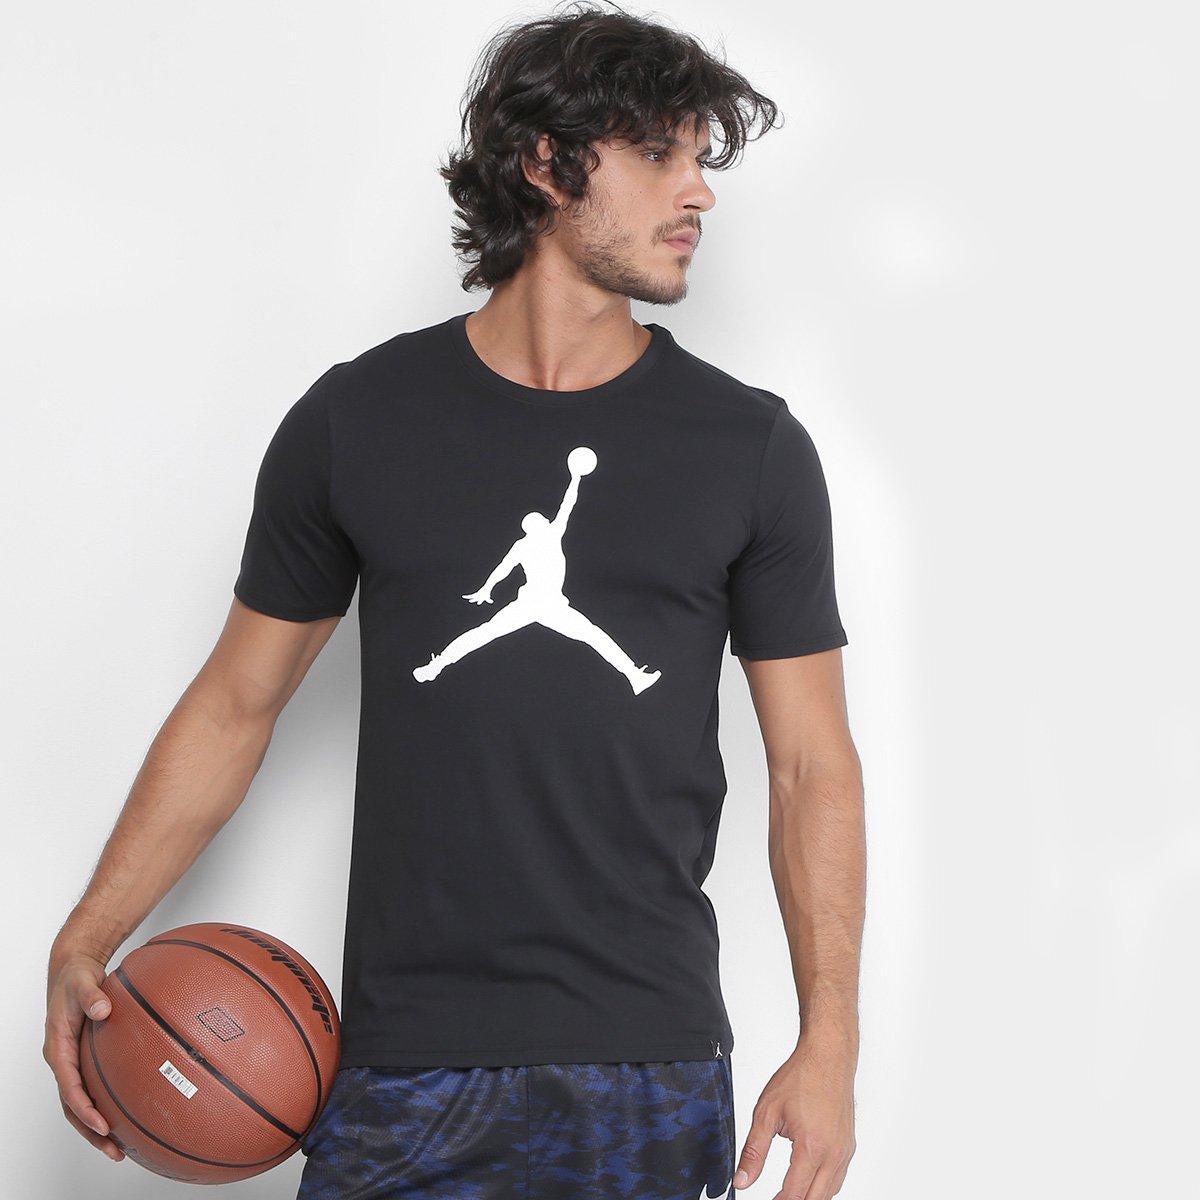 Camiseta Nike Jordan Iconic Jumpman Masculina - Compre Agora  13c96b065f6